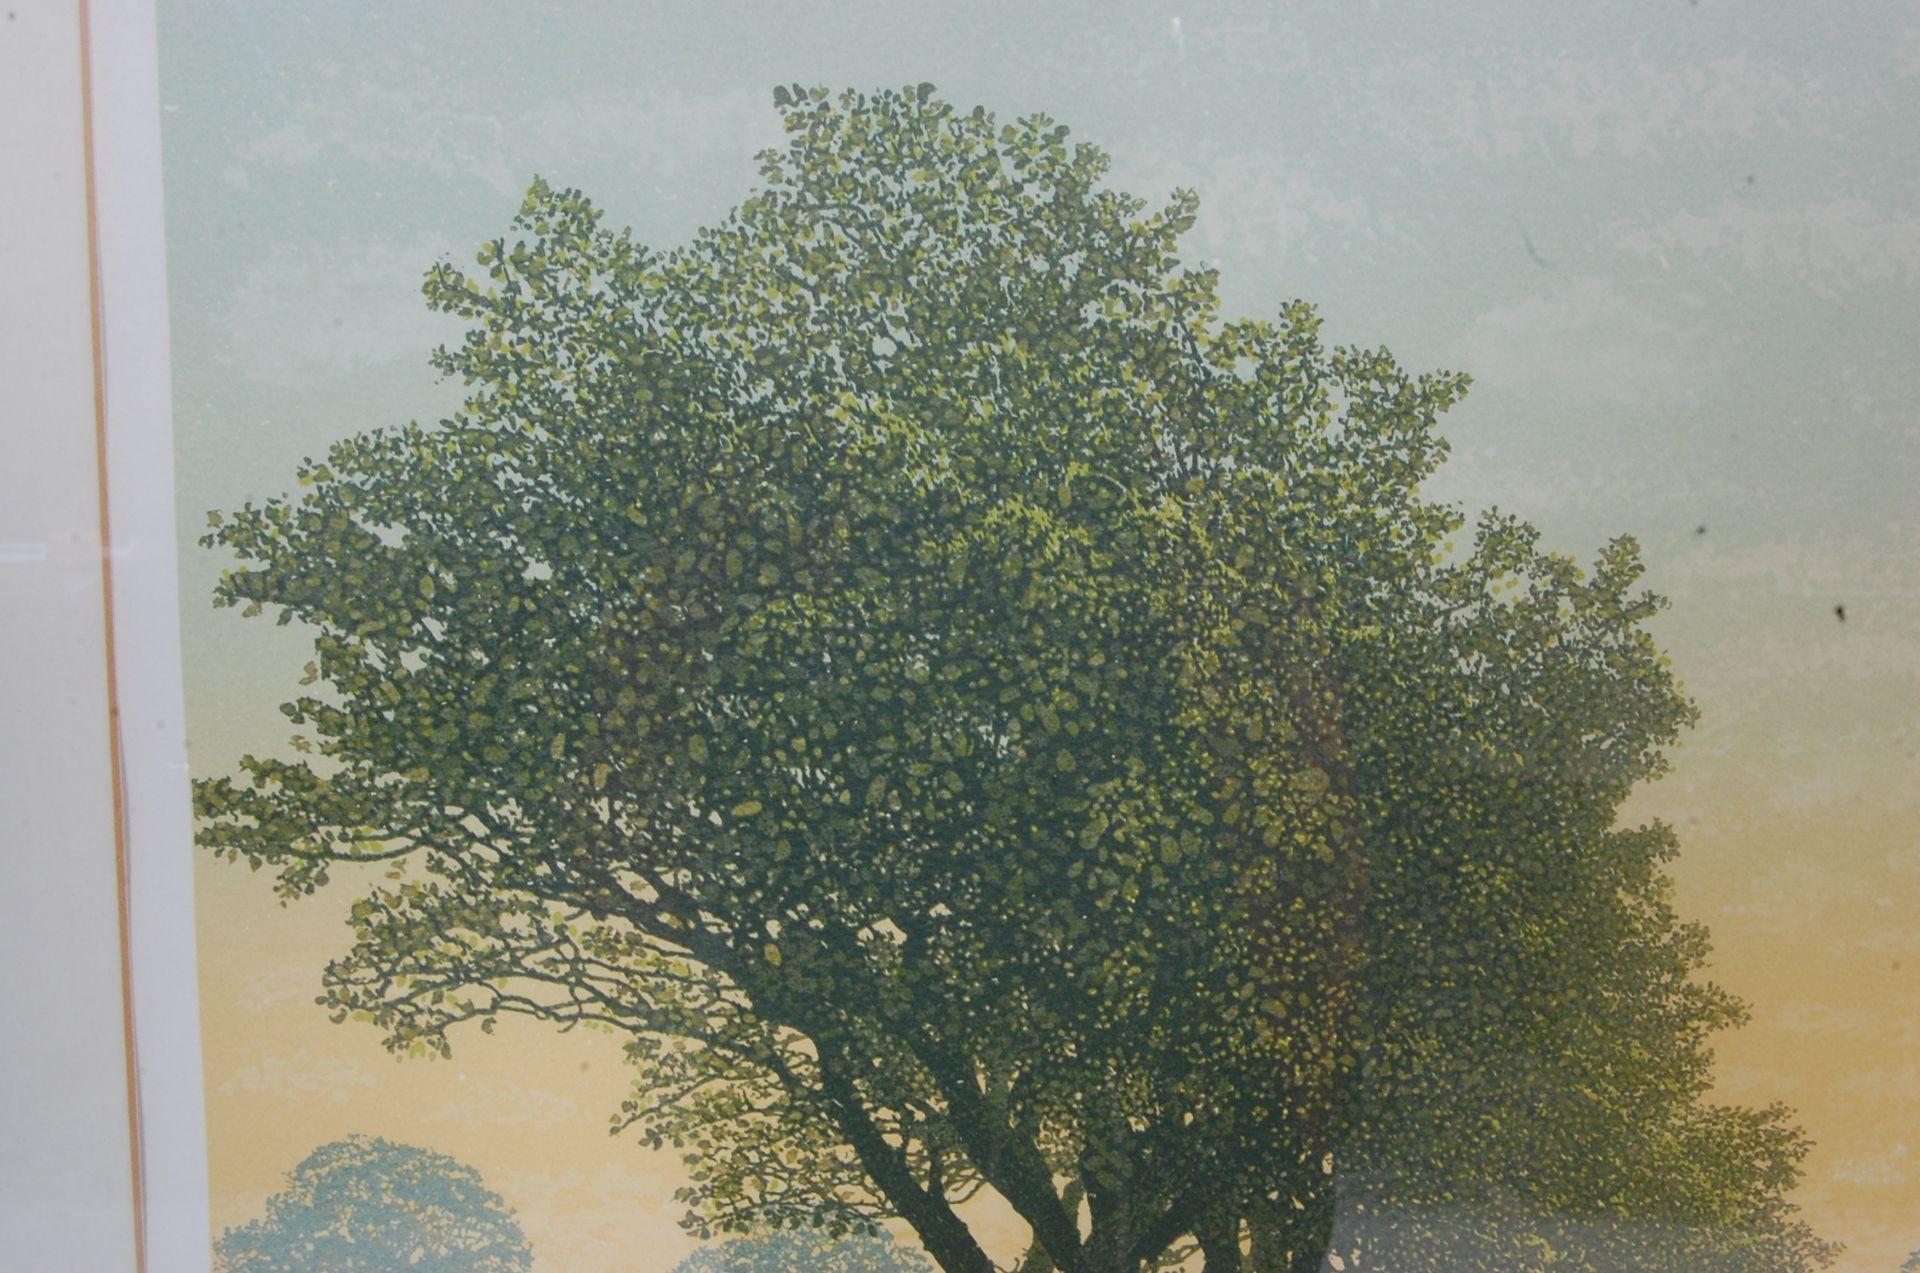 SIGNED LITHOGRAPH PLEINT BY KENNETH LEECH - BRIDLE WAY - Bild 3 aus 8